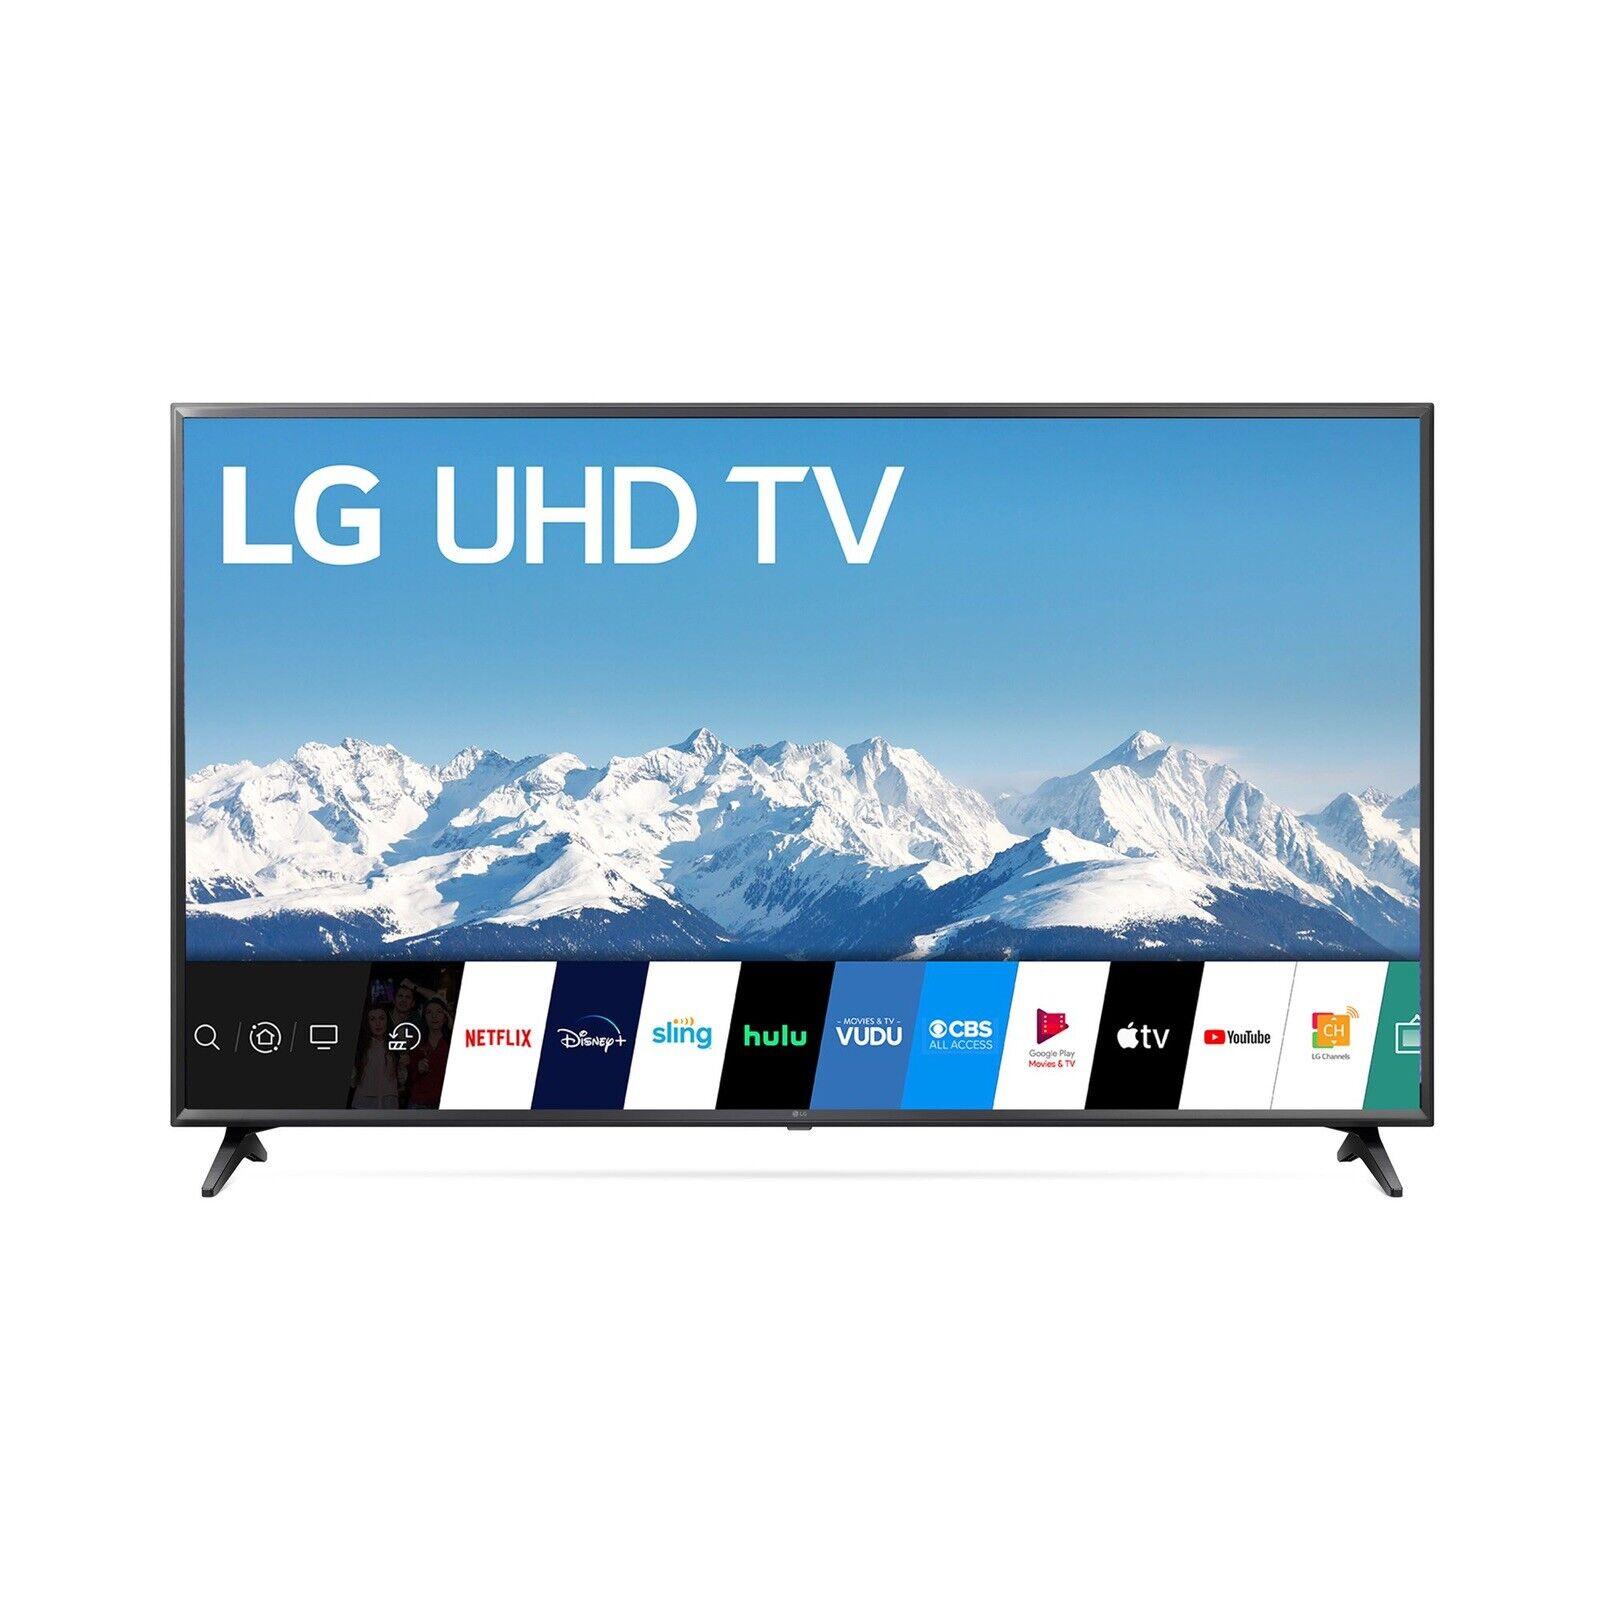 LG 65 Class 4K UHD 2160P Smart TV 65UN6950ZUA 2020 Model. Available Now for 635.00